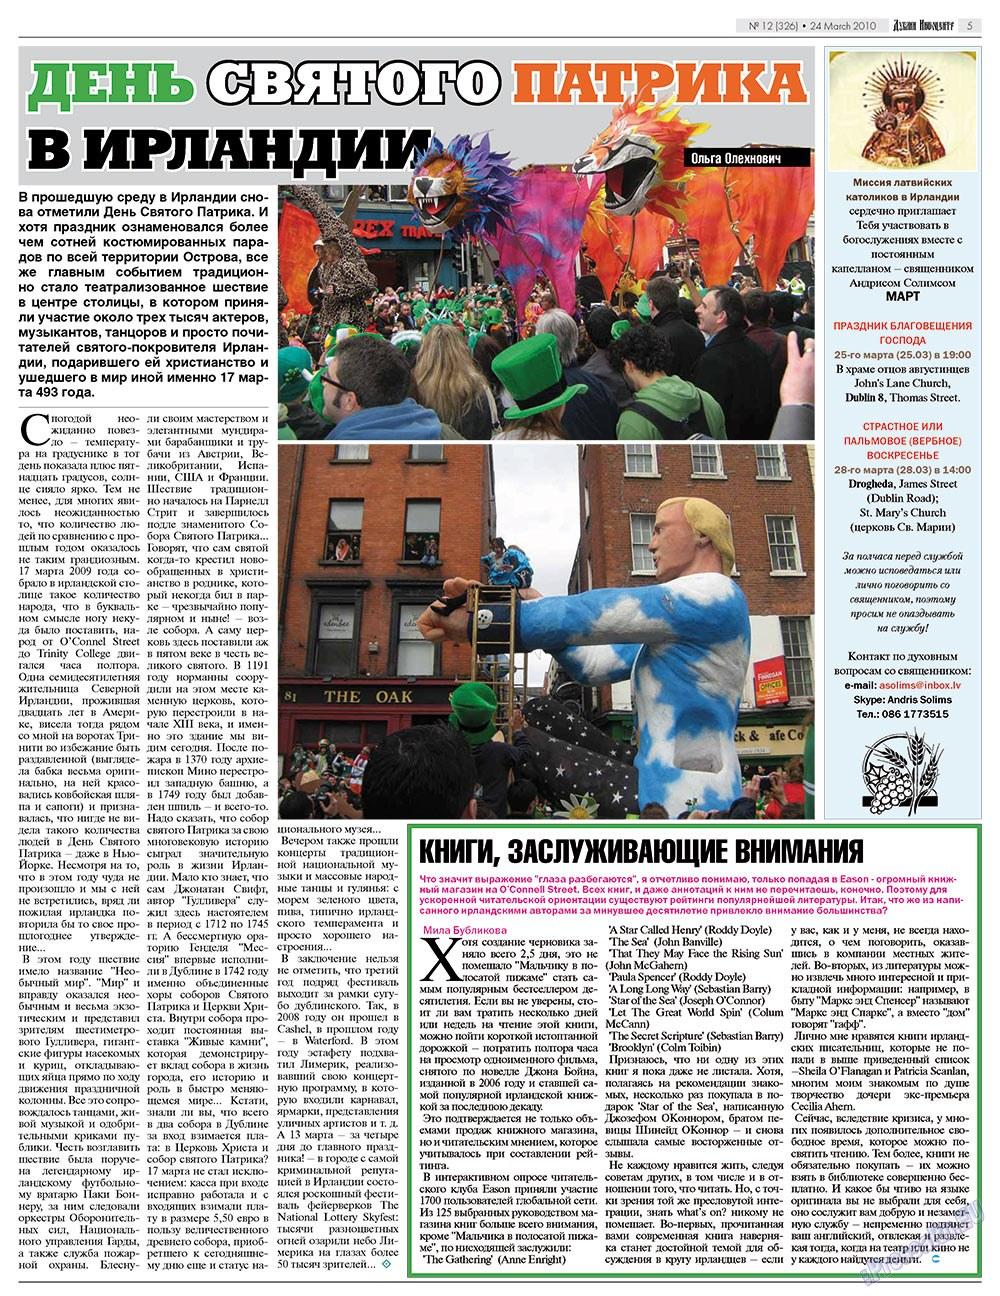 Дублин инфоцентр (газета). 2010 год, номер 12, стр. 5